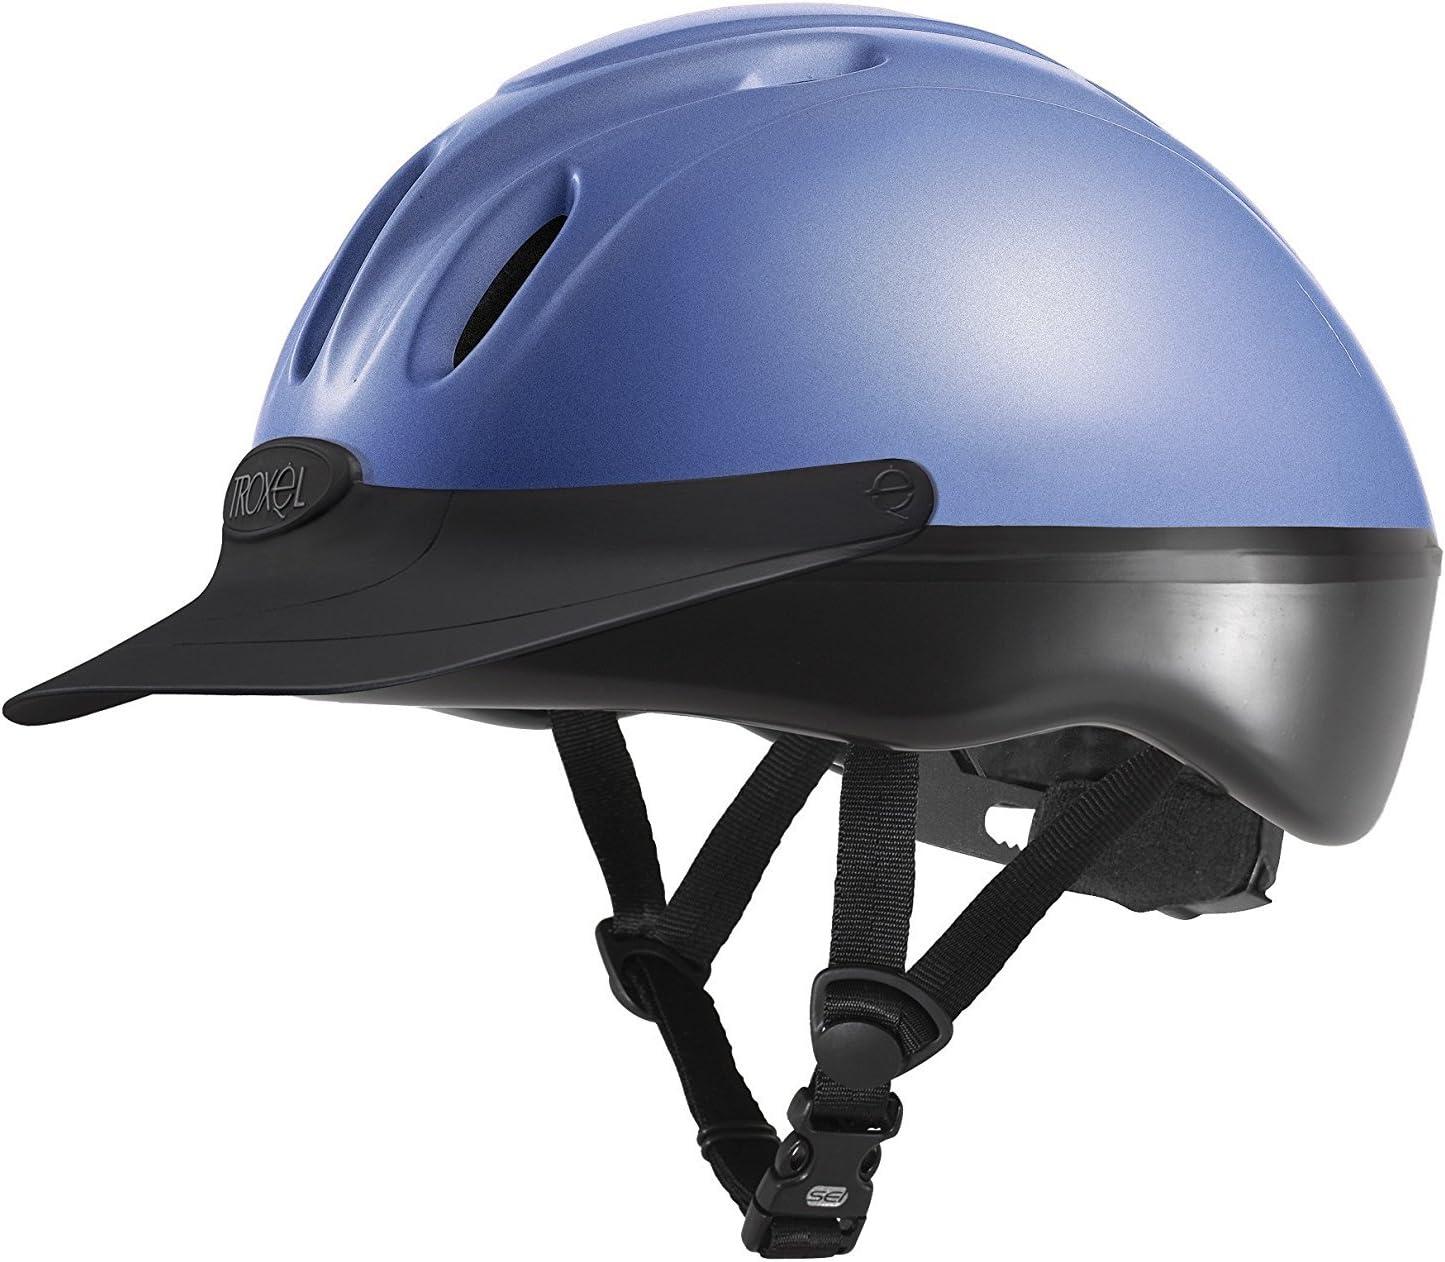 Troxel Spirit All-Purpose Overseas parallel import regular item Helmet Super intense SALE Riding